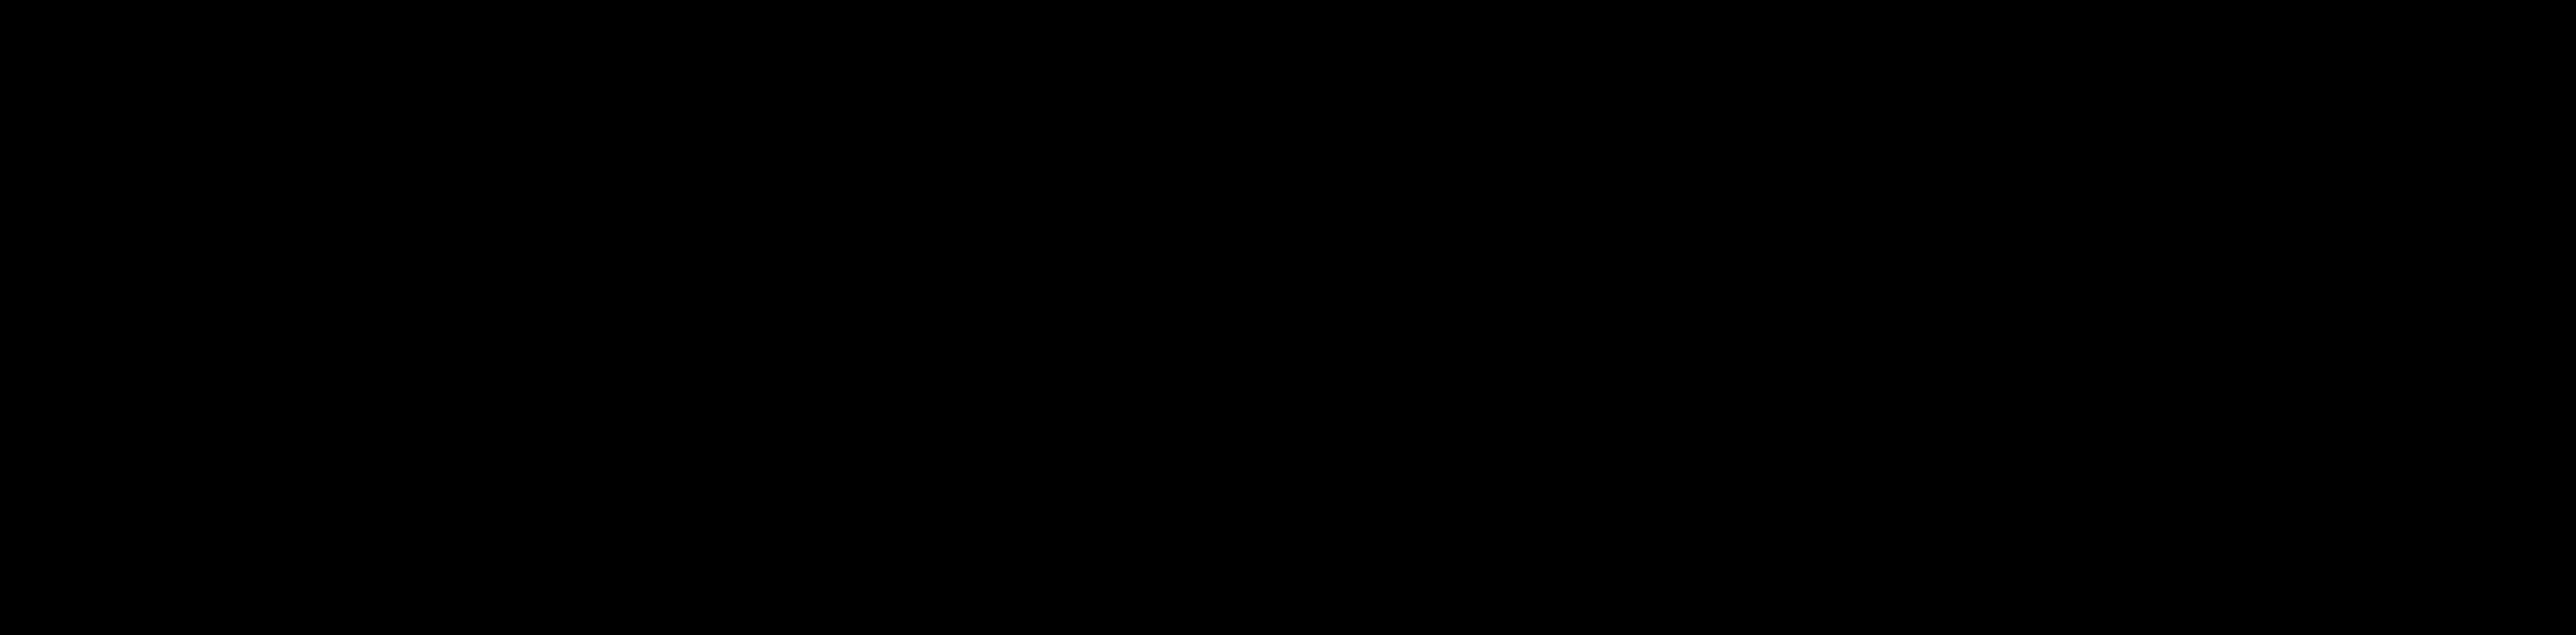 starz logo - STARZ Logo